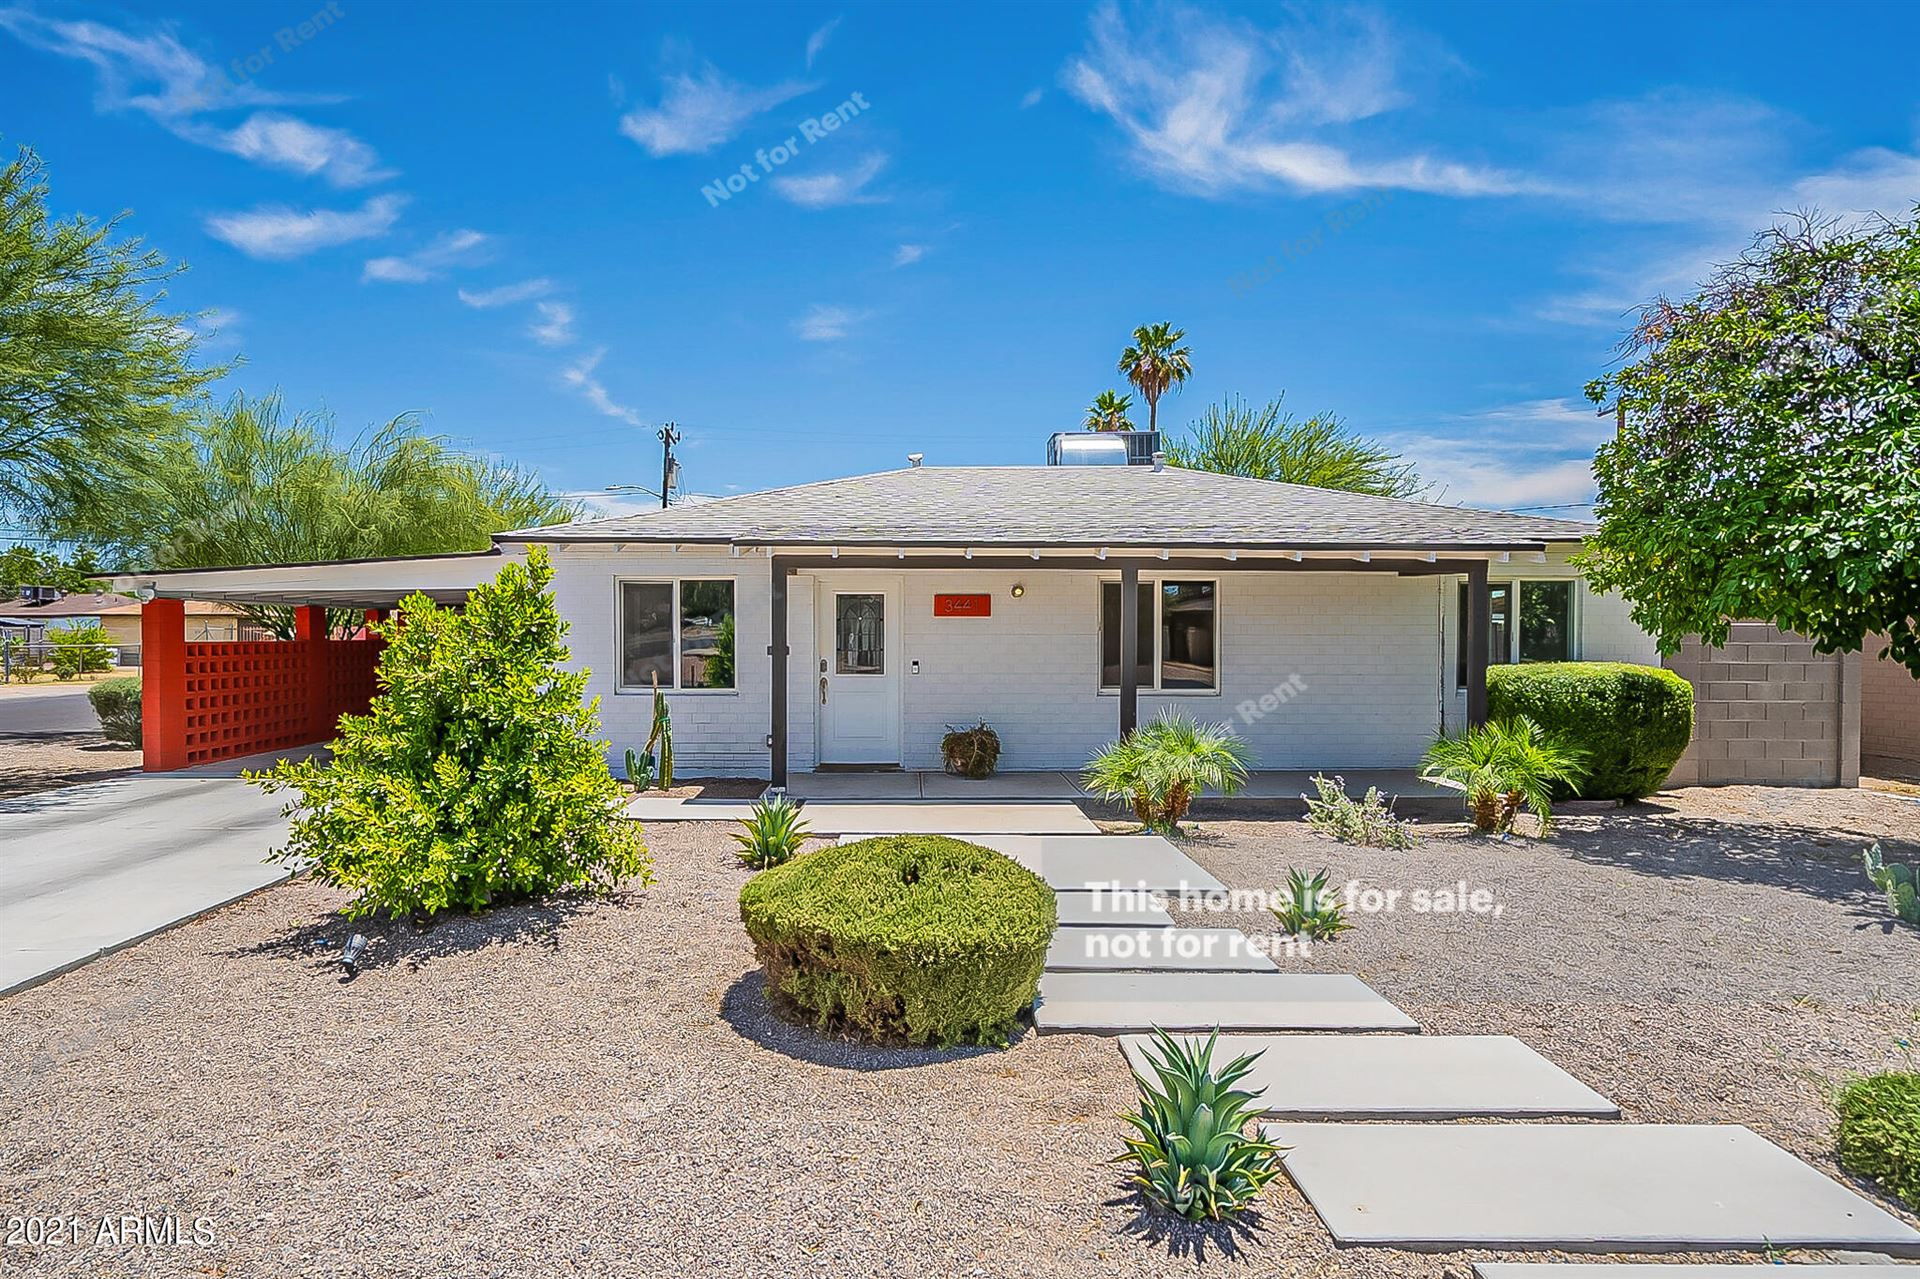 3441 N 21ST Drive, Phoenix, AZ 85015 - MLS#: 6247910